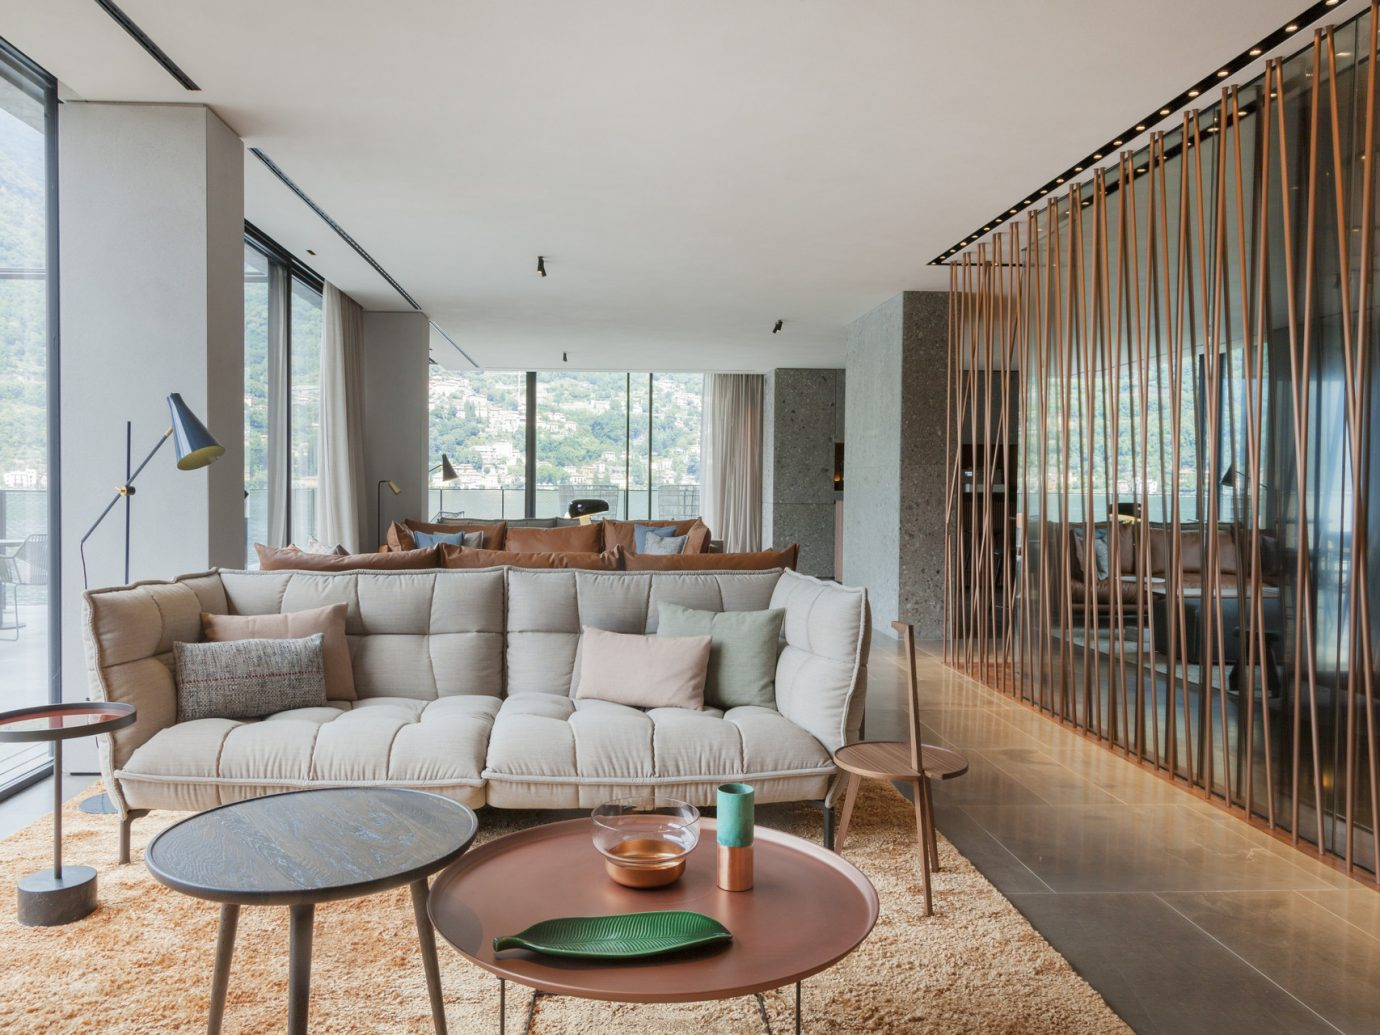 Lounge at Le Sereno in St. Bars